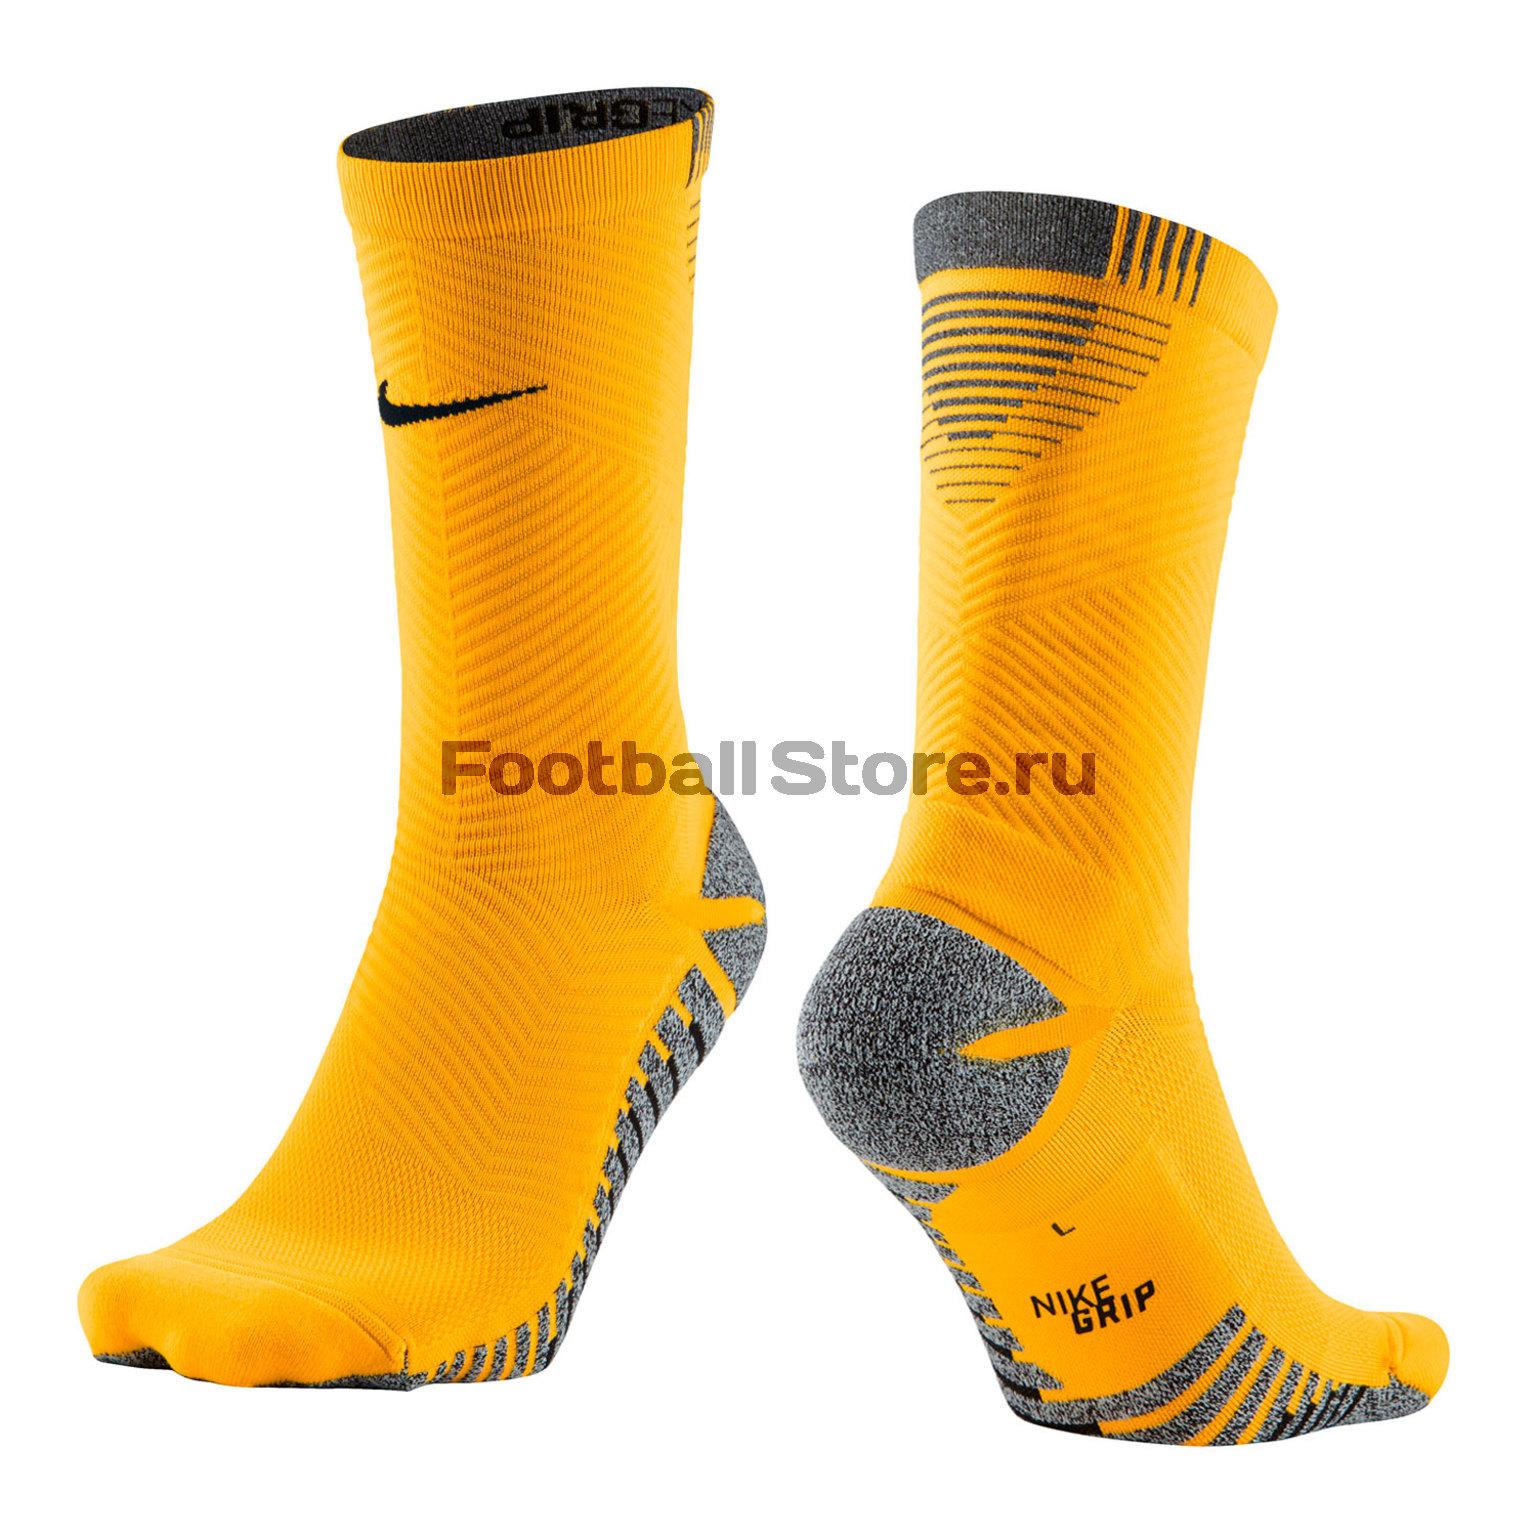 Носки Nike Носки Nike Grip Strike Light Crew SX5486-857 носки nike носки nike grip strike lightweight sx5089 525